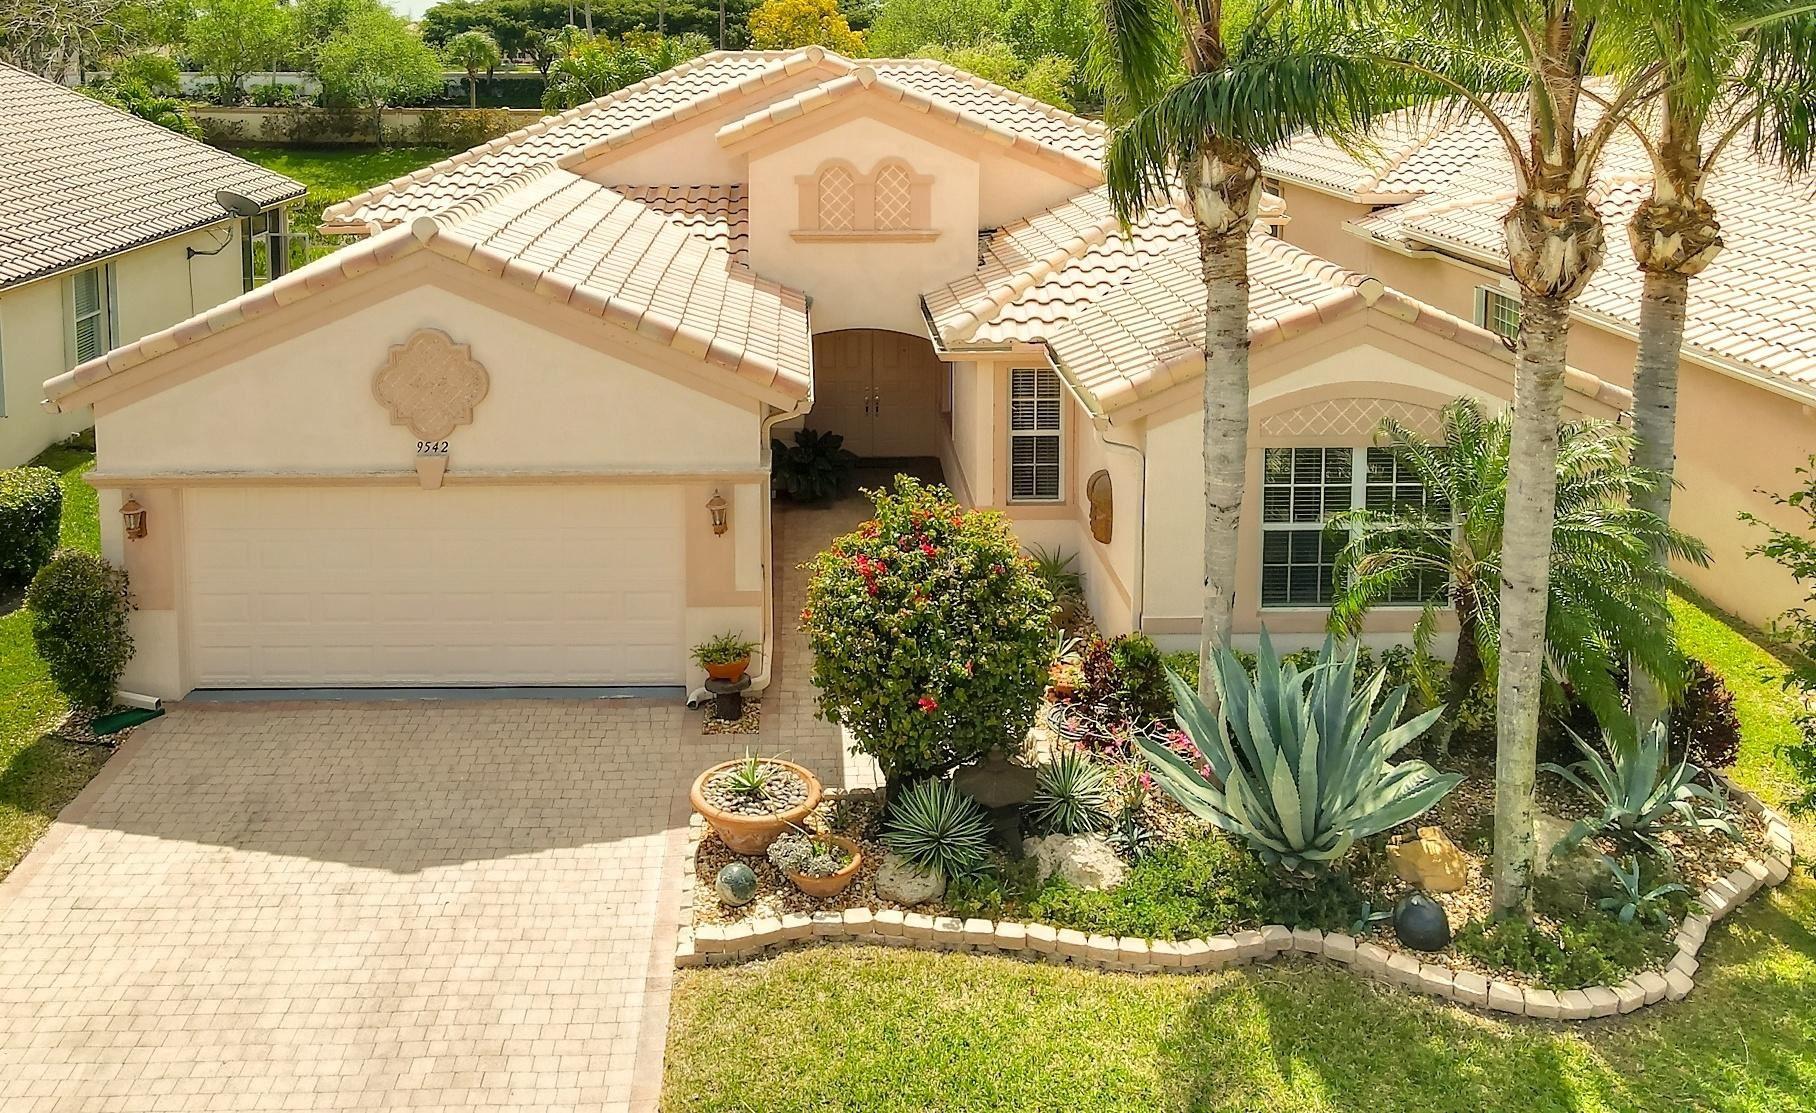 9542 Vercelli Street, Lake Worth, FL 33467 - #: RX-10699559